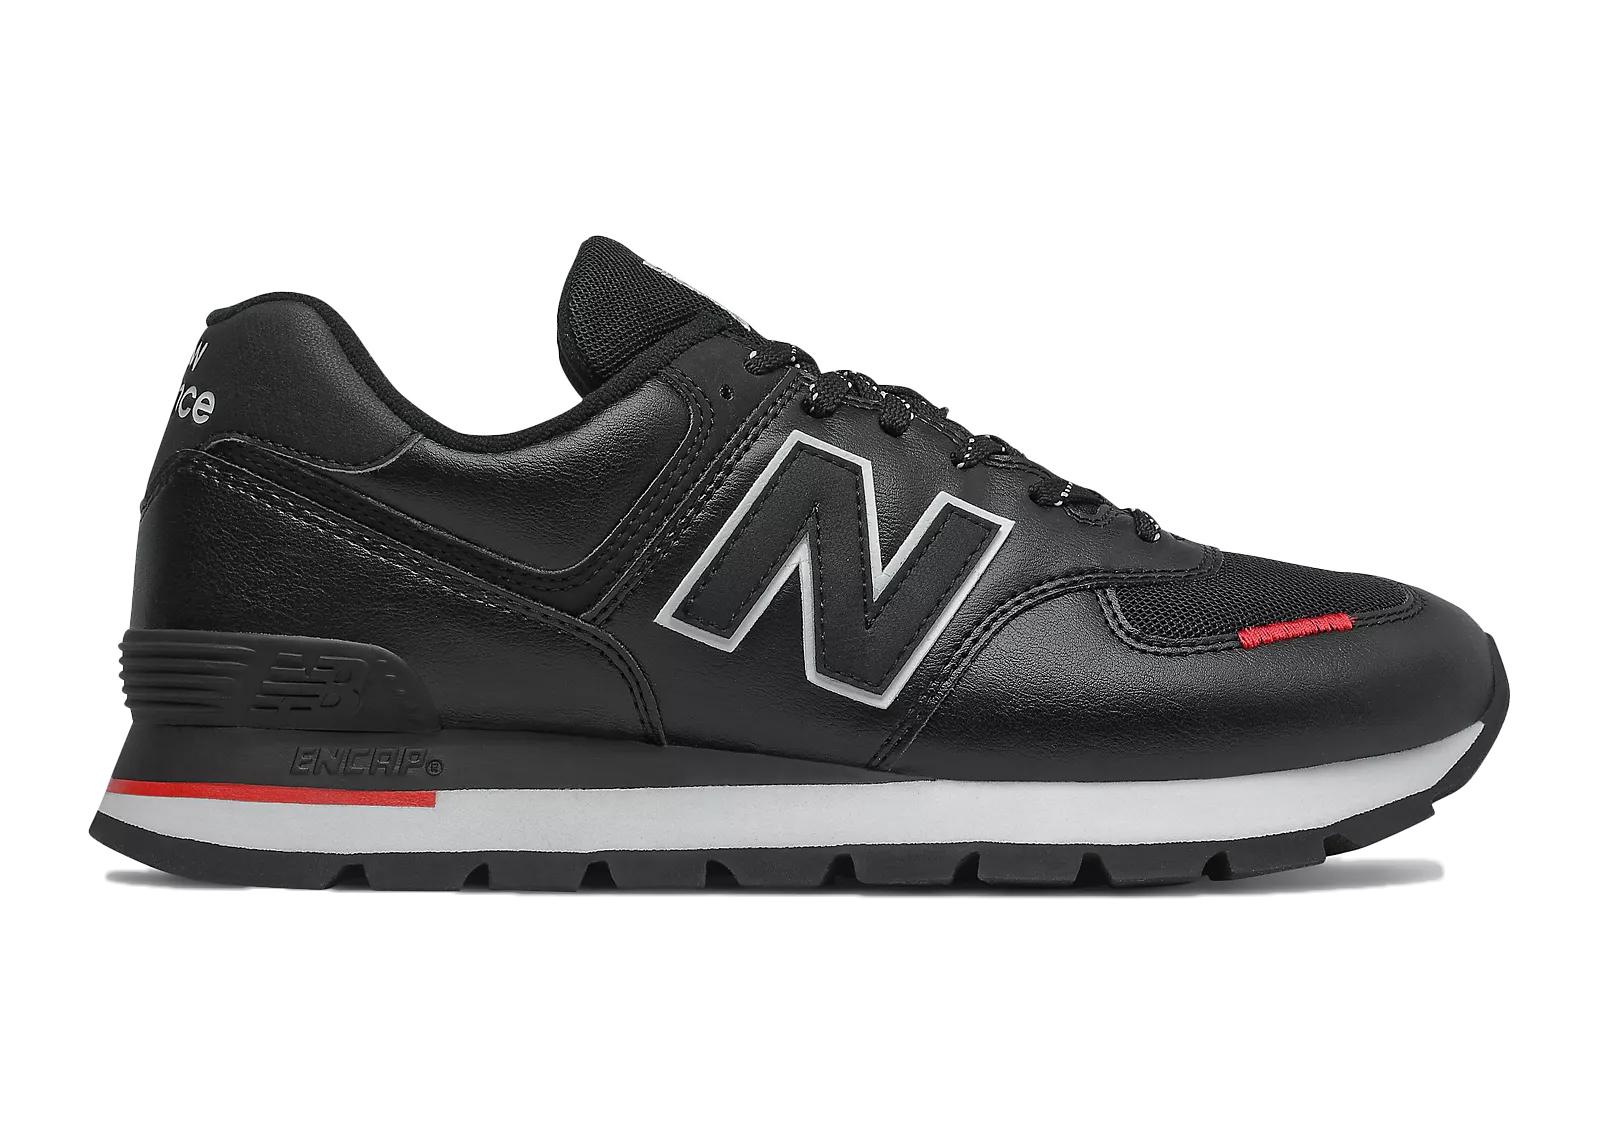 New Balance 574 Rugged Black